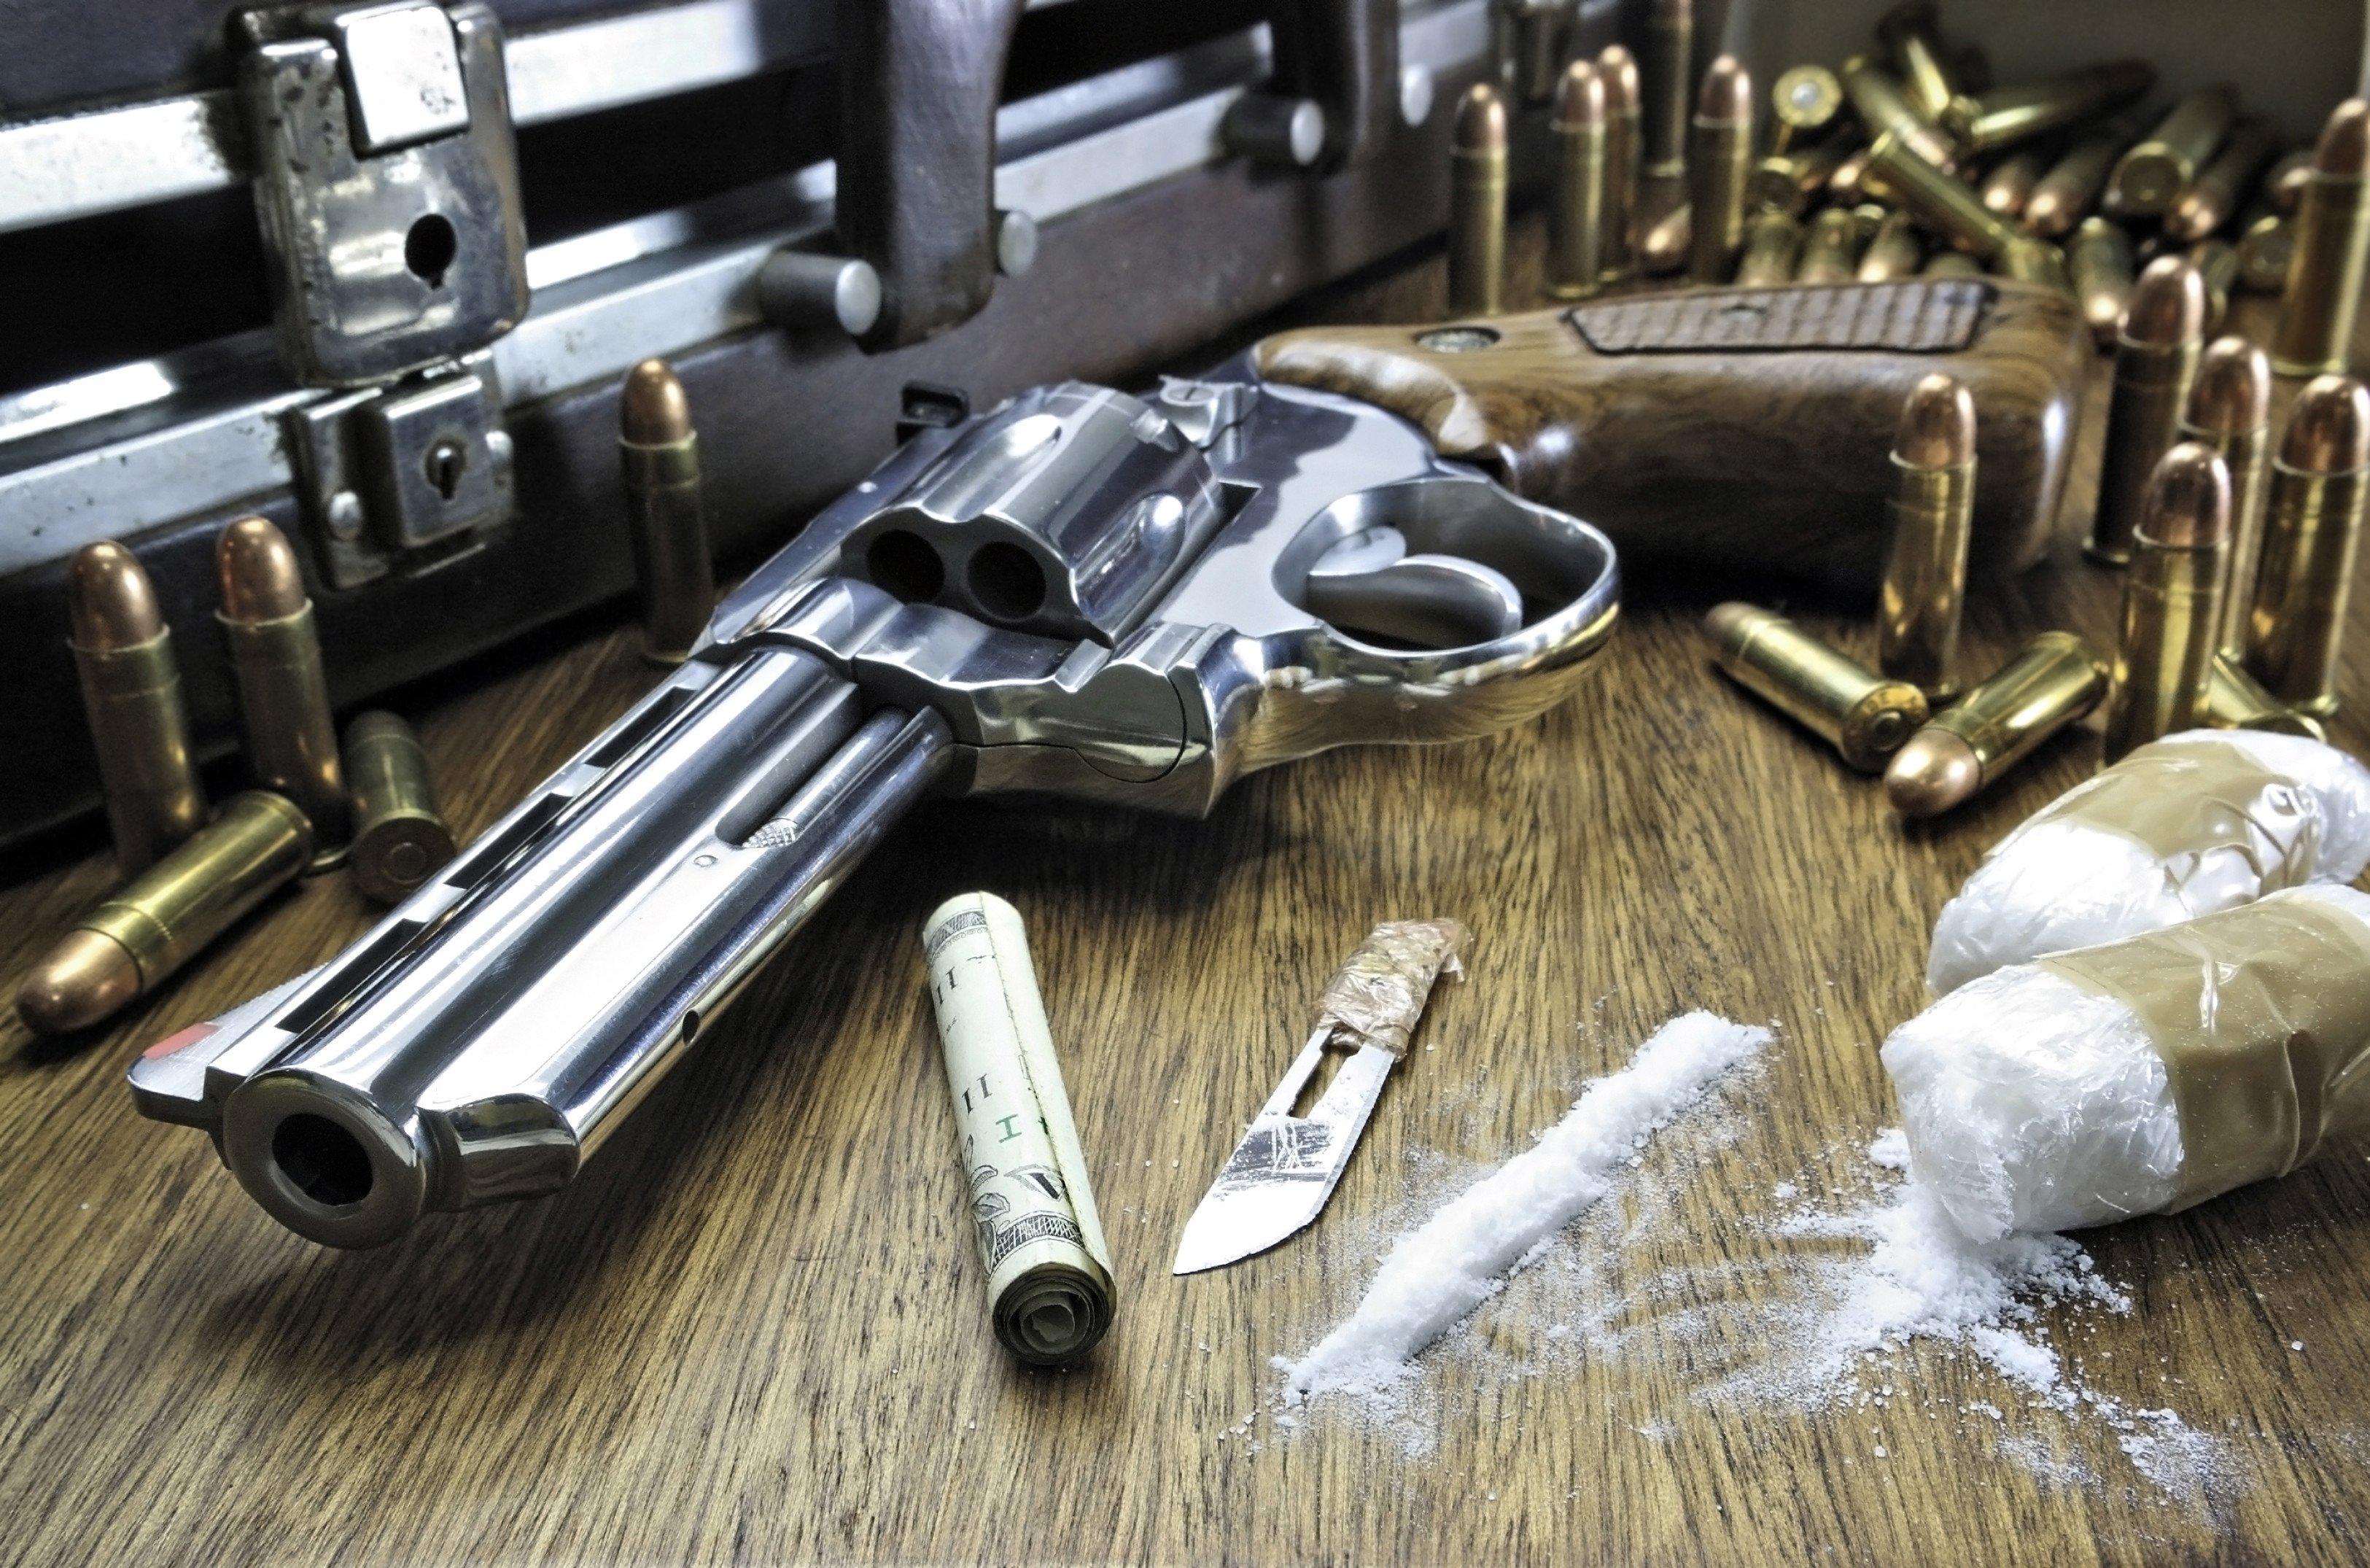 drugs cocaine dark weapon gun cigarette ammo bullet crime wallpaper 3250x2150